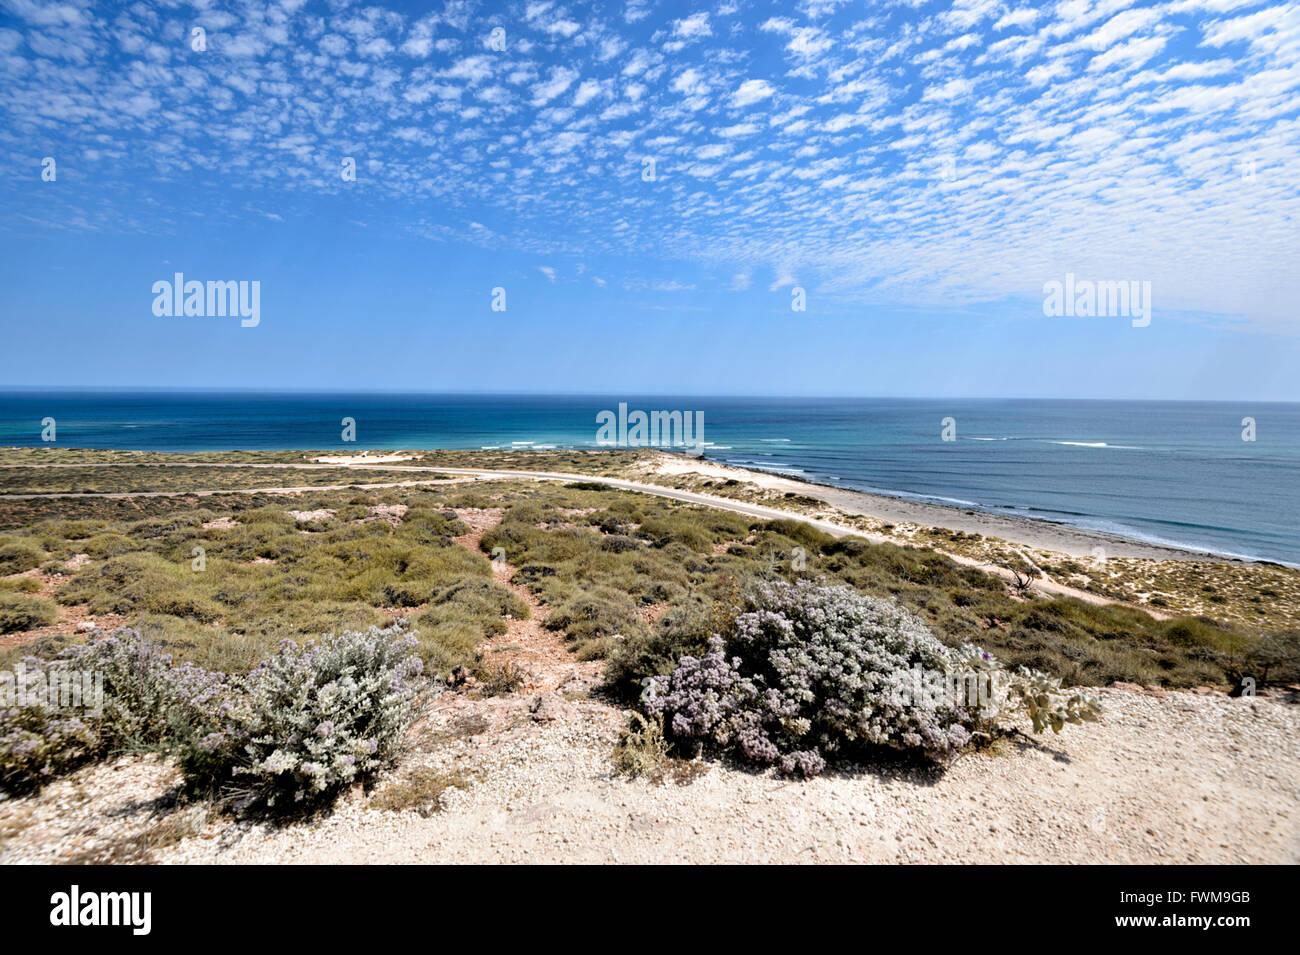 Ningaloo Coast, Western Australia, WA, Australia - Stock Image